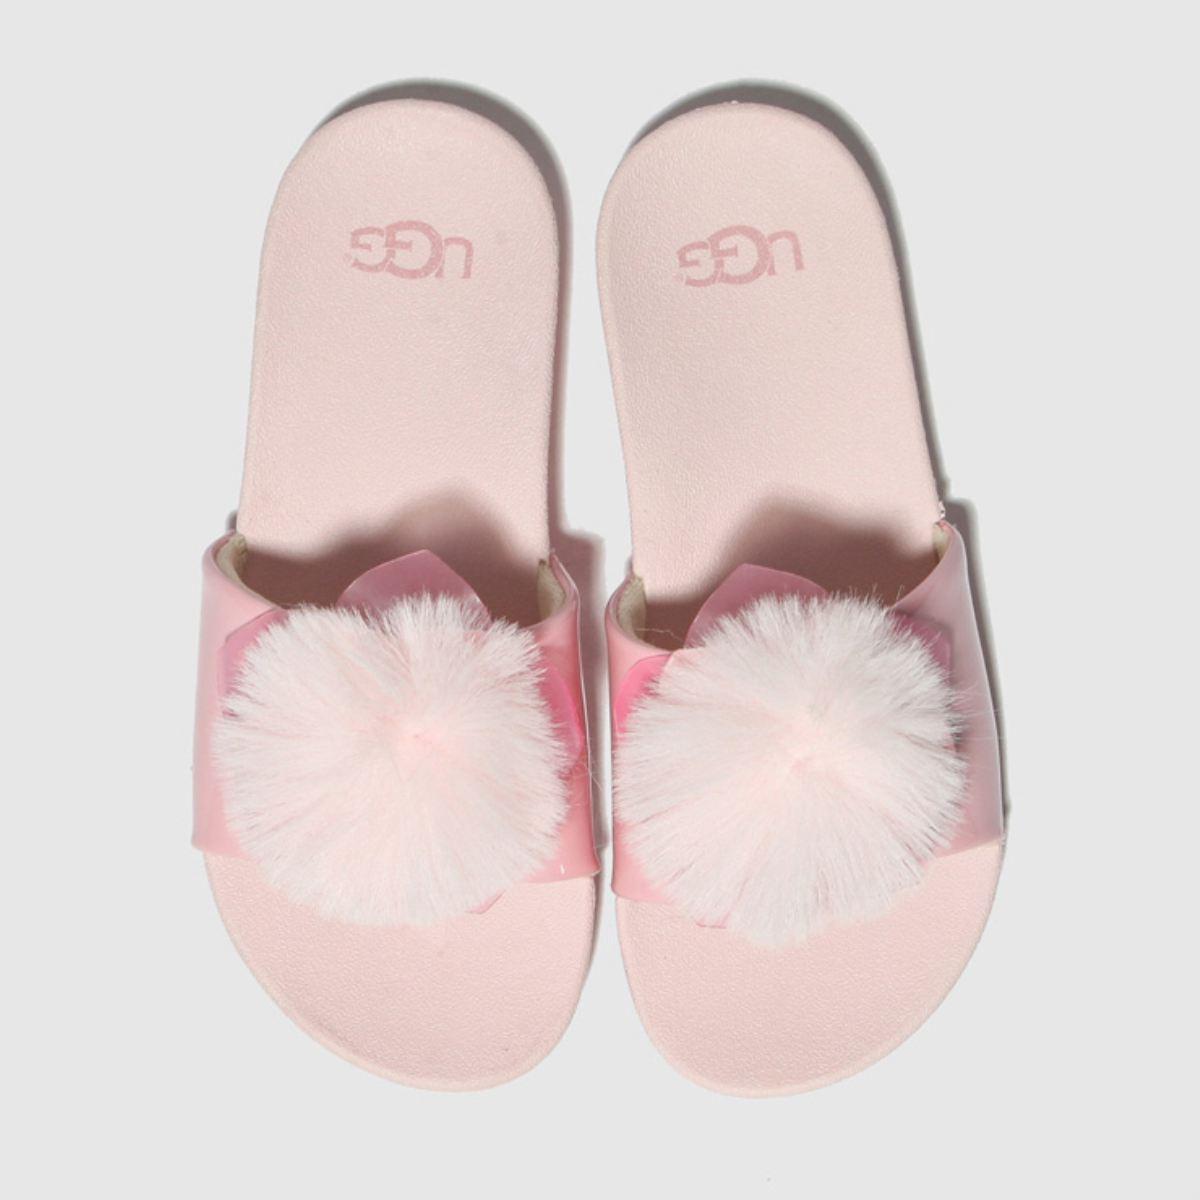 Ugg Pale Pink Cactus Flower Slide Trainers Junior